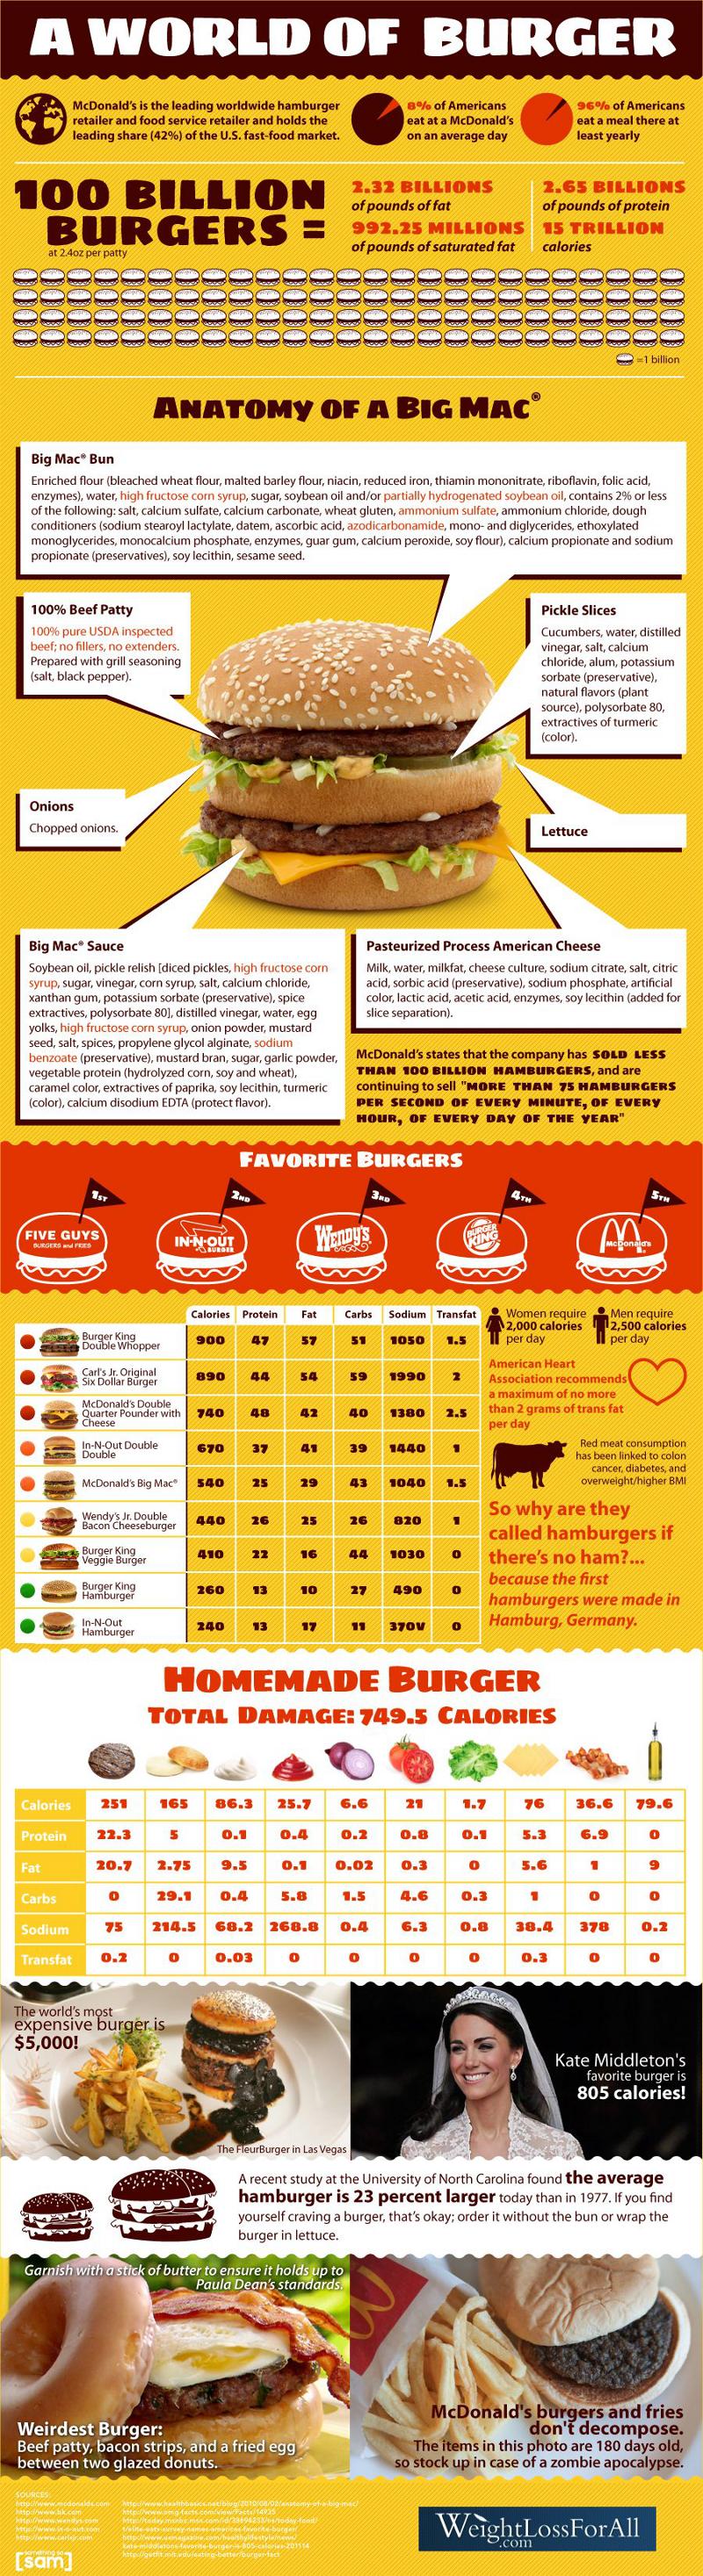 McDonalds Burger Consumption